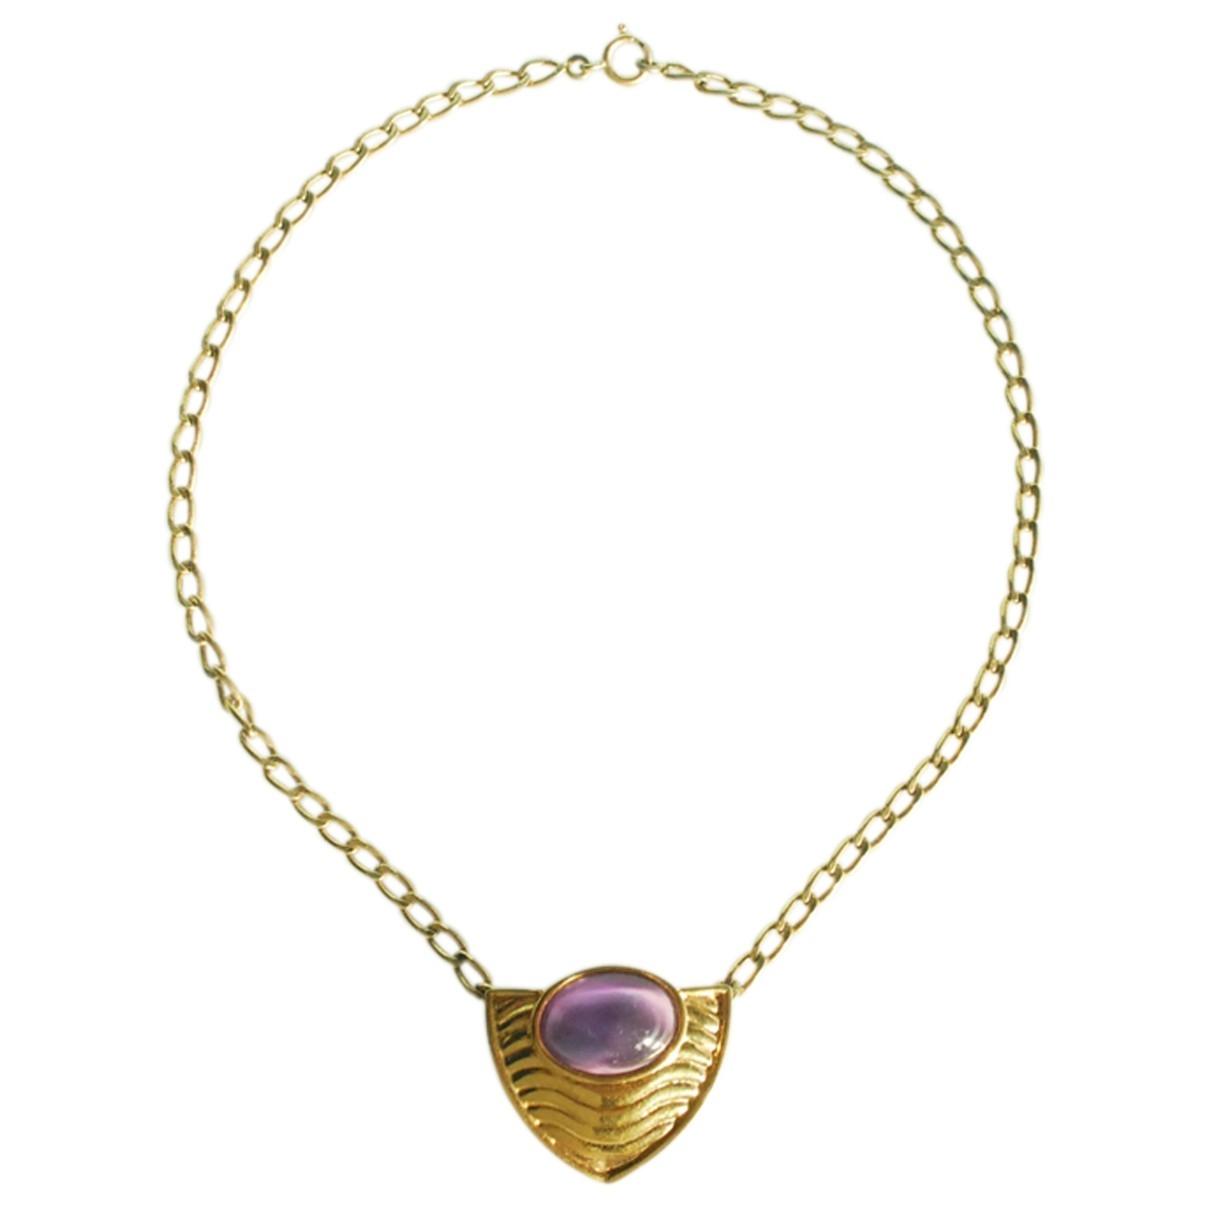 Lanvin \N Gold Metal necklace for Women \N